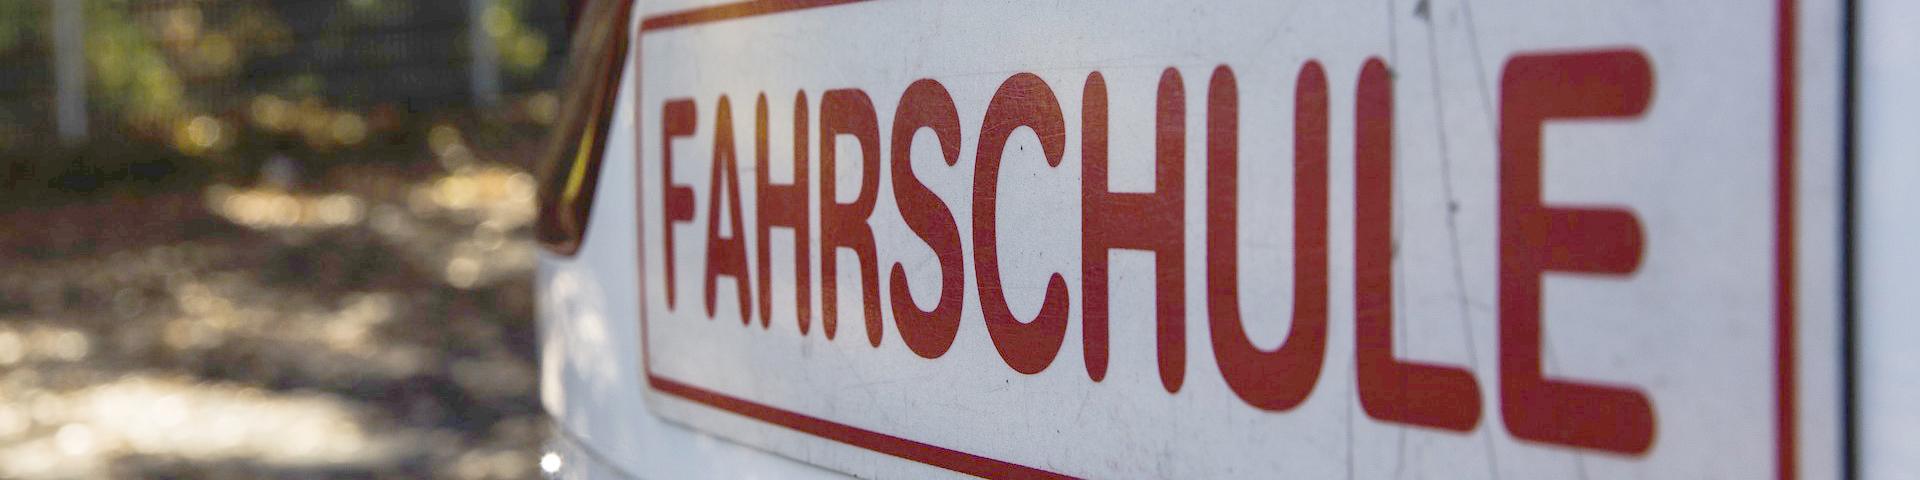 S&T Fahrschule in Berlin Weissensee, Pankow und Prenzlauer Berg